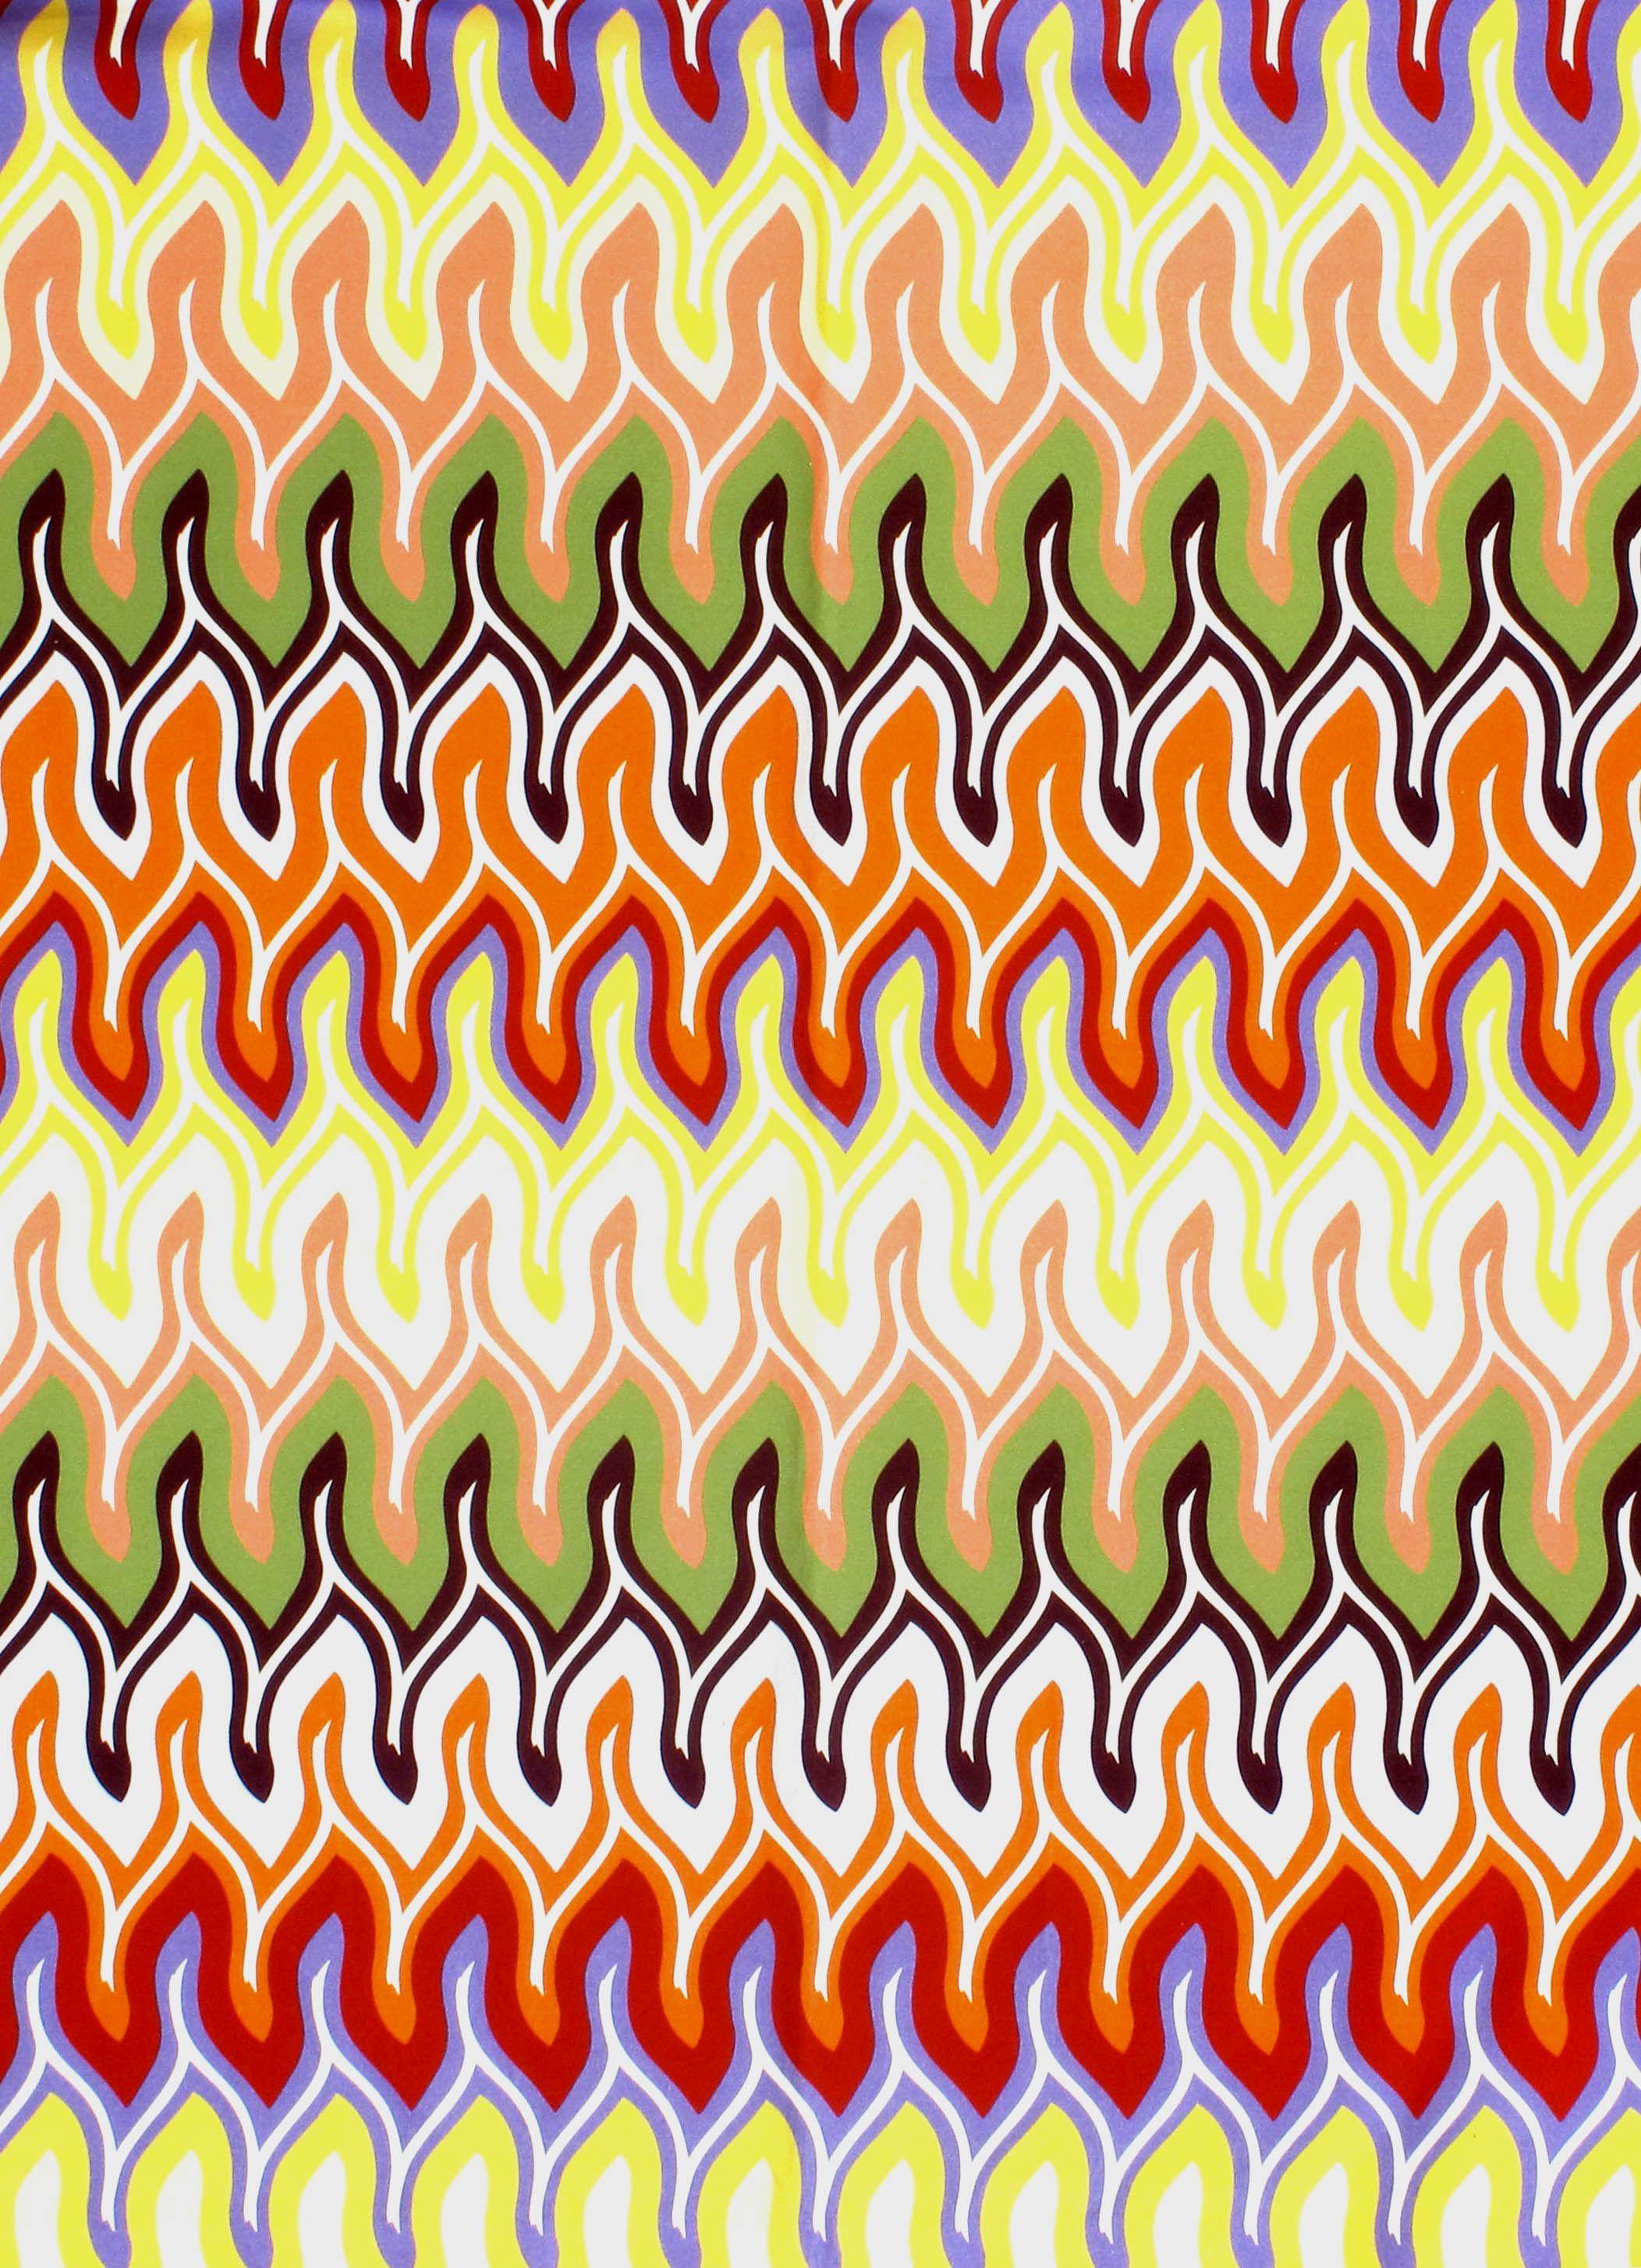 Missoni Nadaun Fiesta By Stark Fabric   Stark Carpet